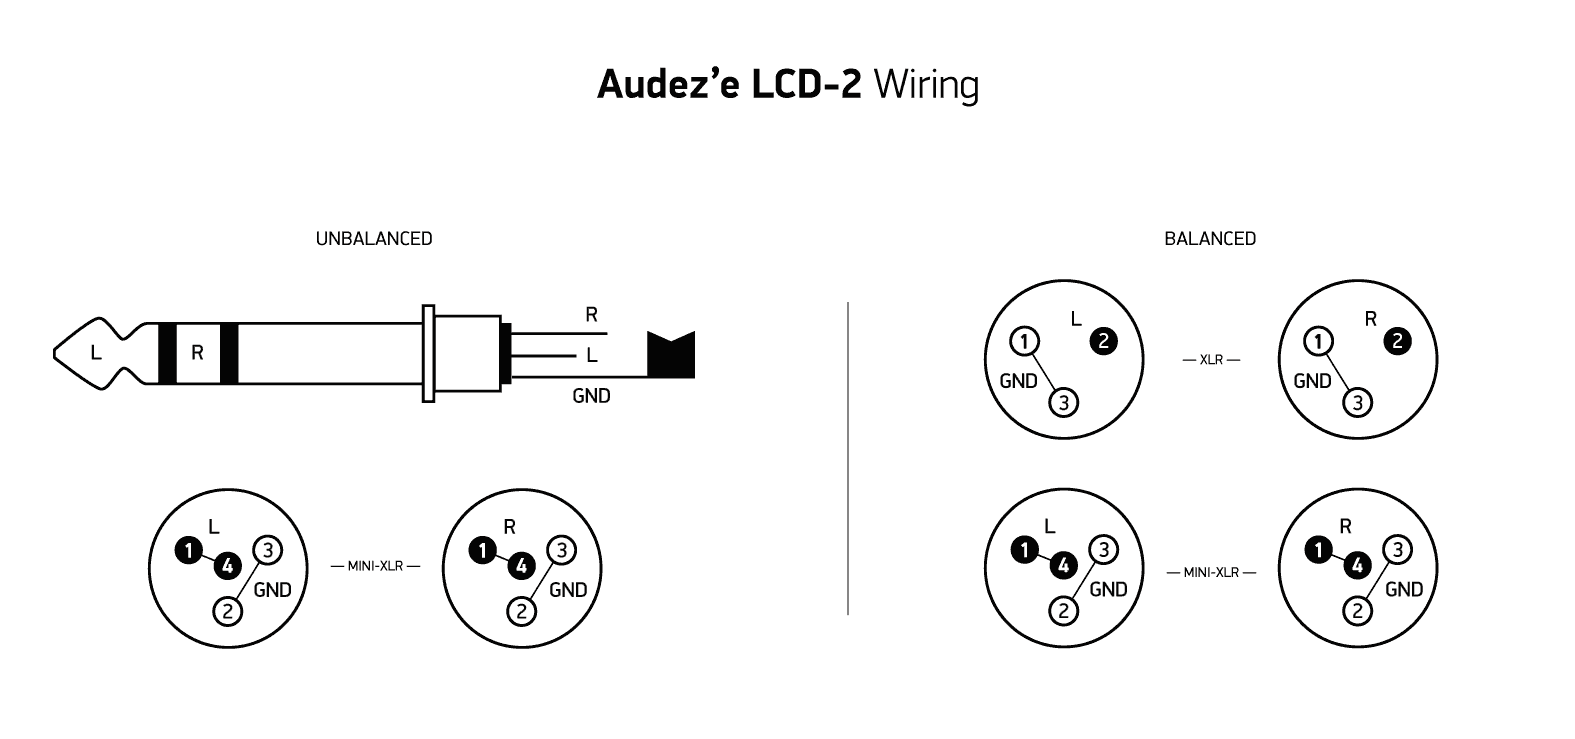 4 Pin Audeze Xlr Wiring Diagram Diy Audio Electronics From Zynsonix Com November 2011